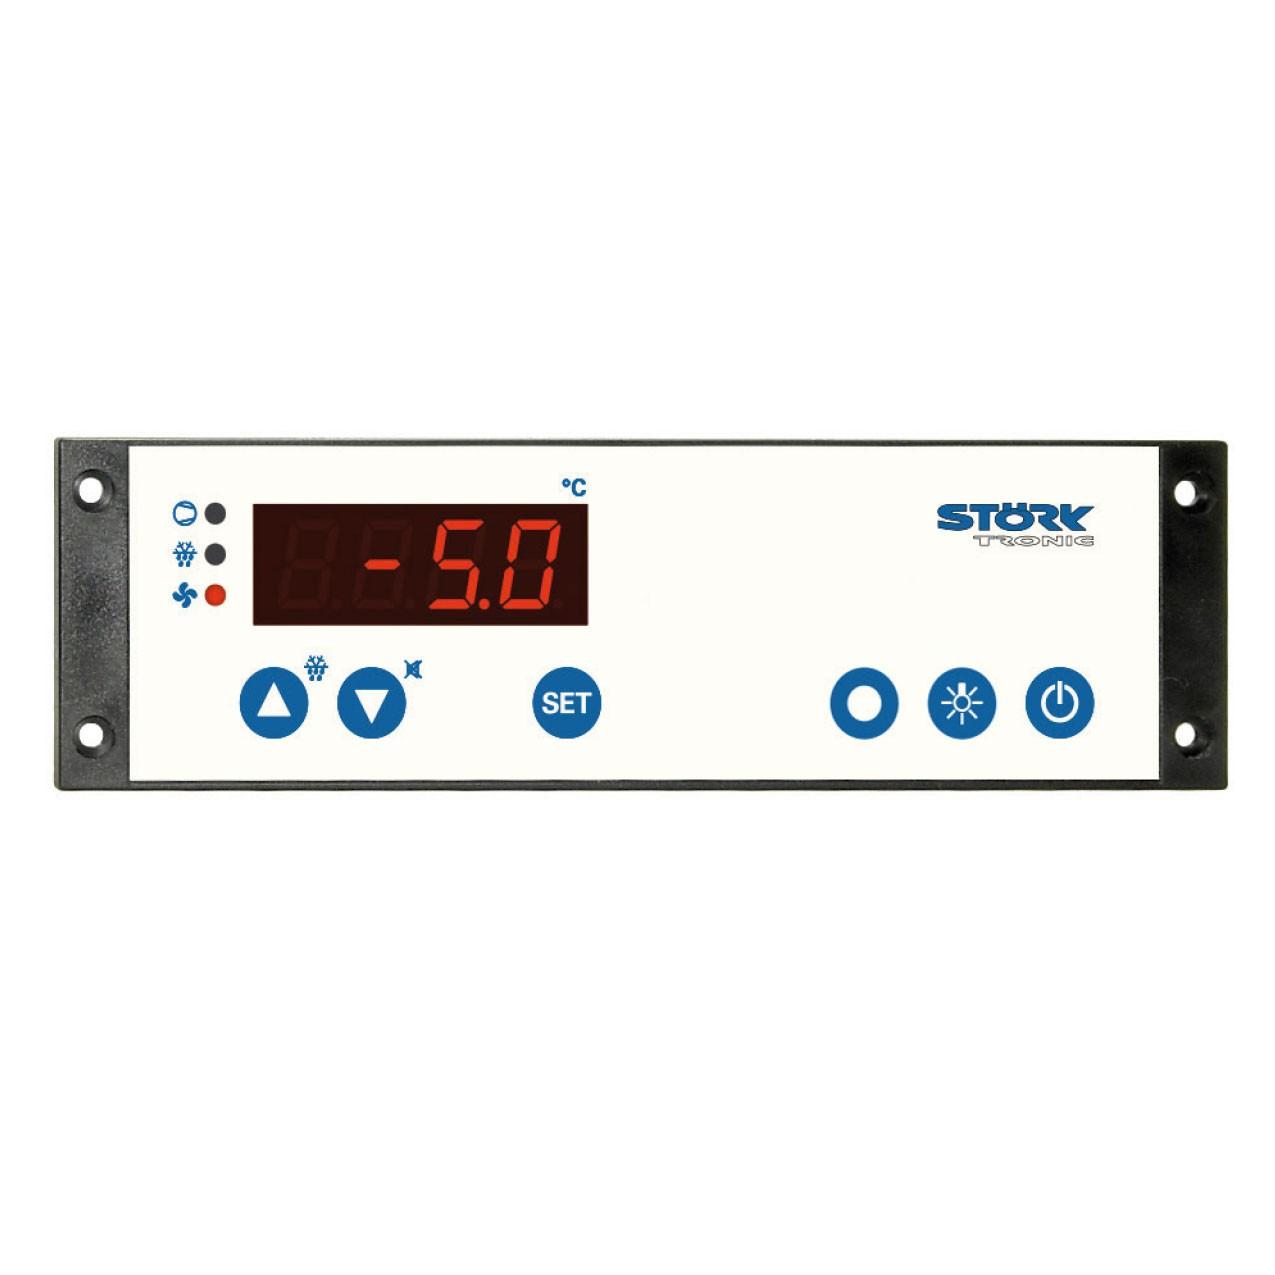 Störk Kühlstellenregler ST181-LP4KAR.112 (incl. 2 Fühler, 2m Kabel und 1 Gegenstecker) ST 181